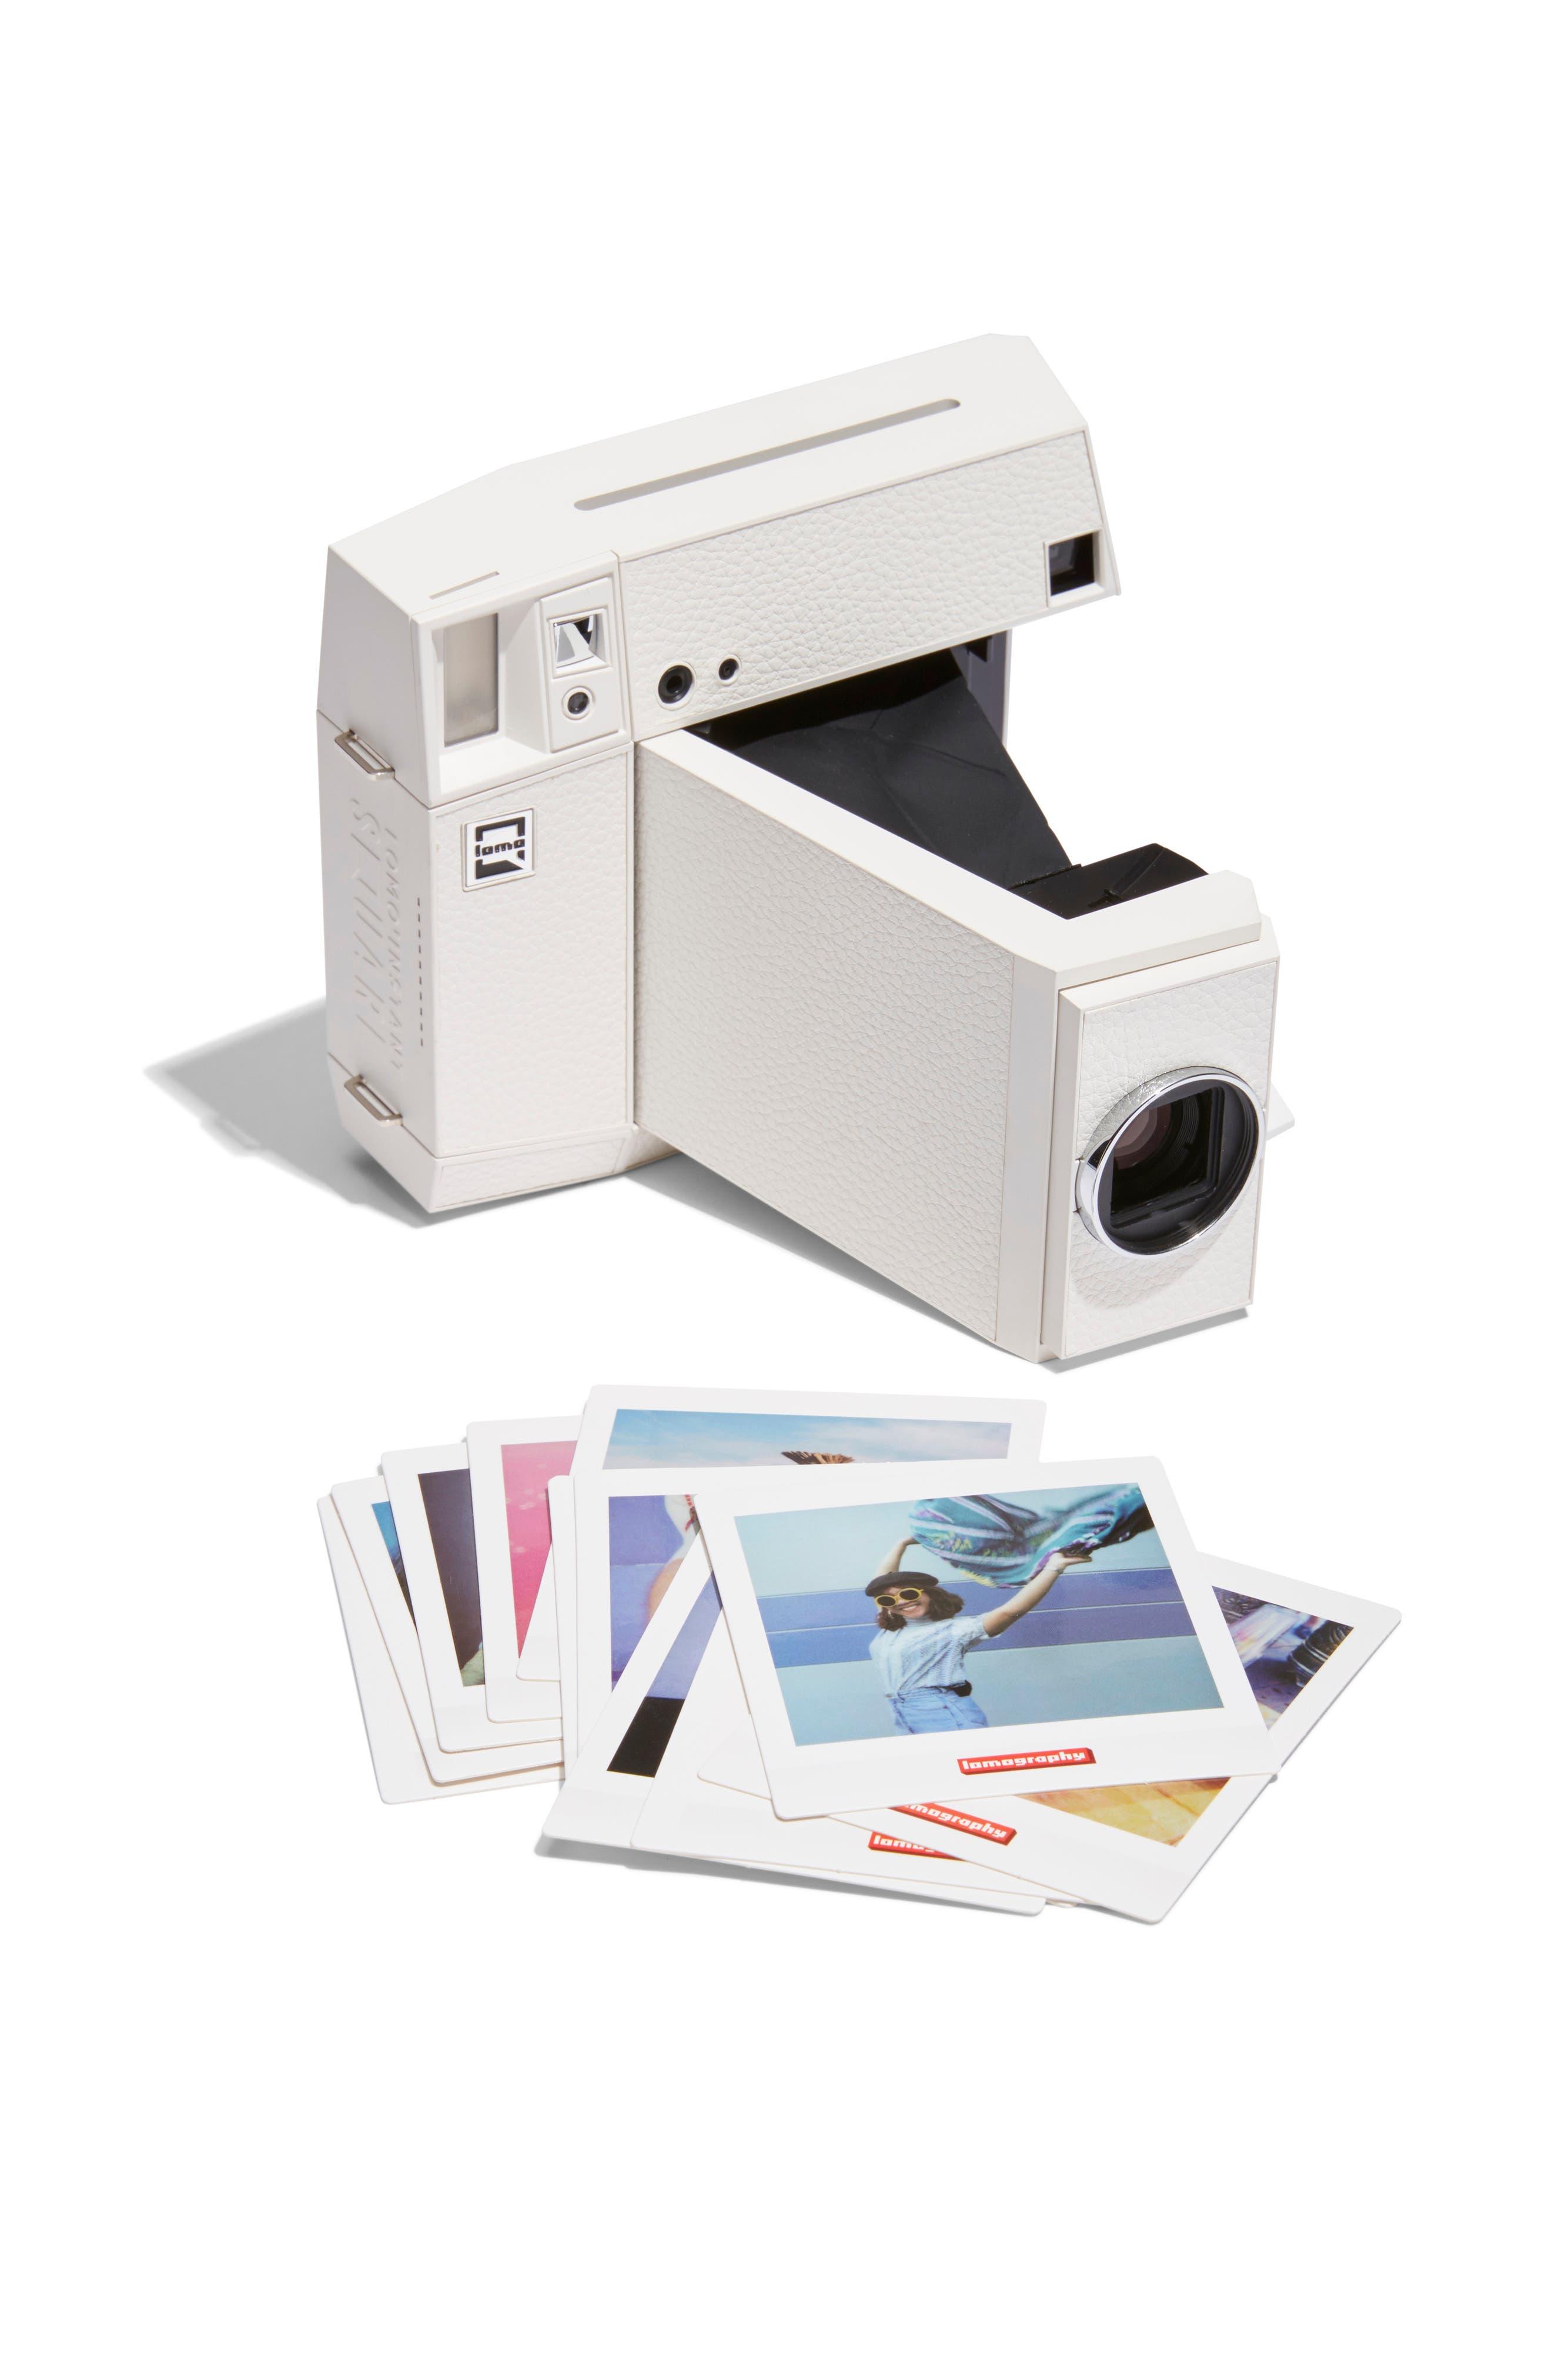 Lomo'Instant Square Glass Black Edition Instant Camera,                         Main,                         color, WHITE